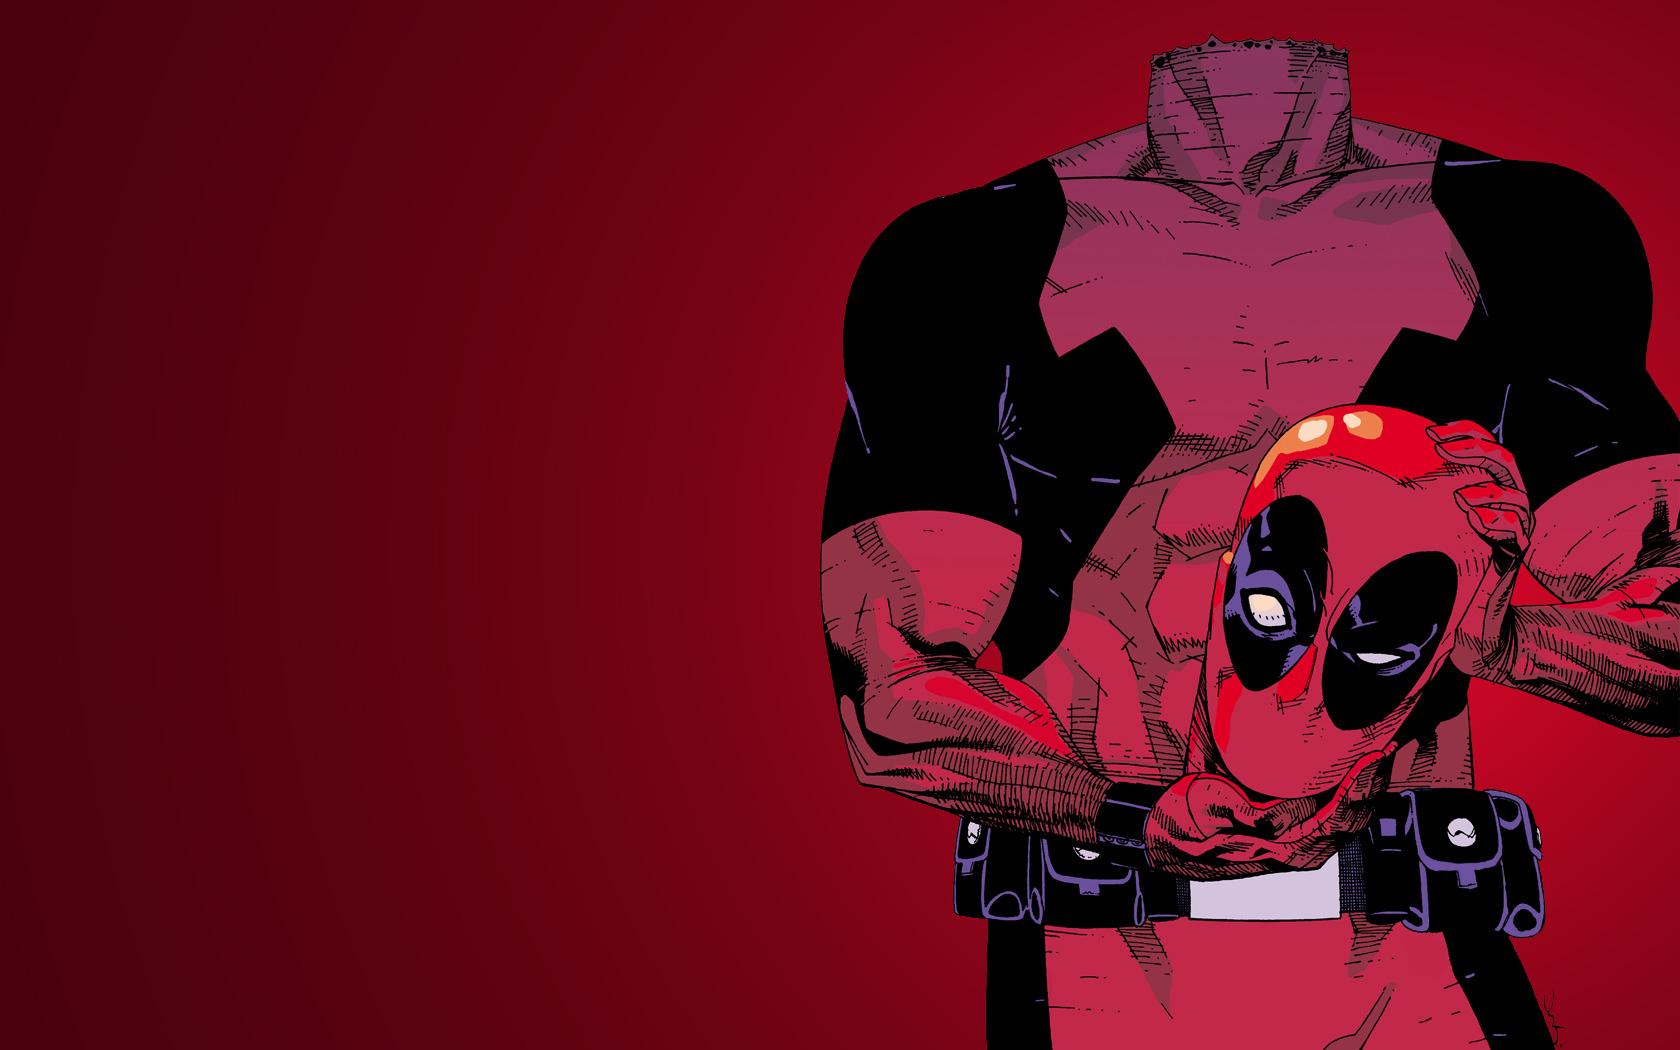 Deadpool Live Wallpaper For Computer Wallpapersafari